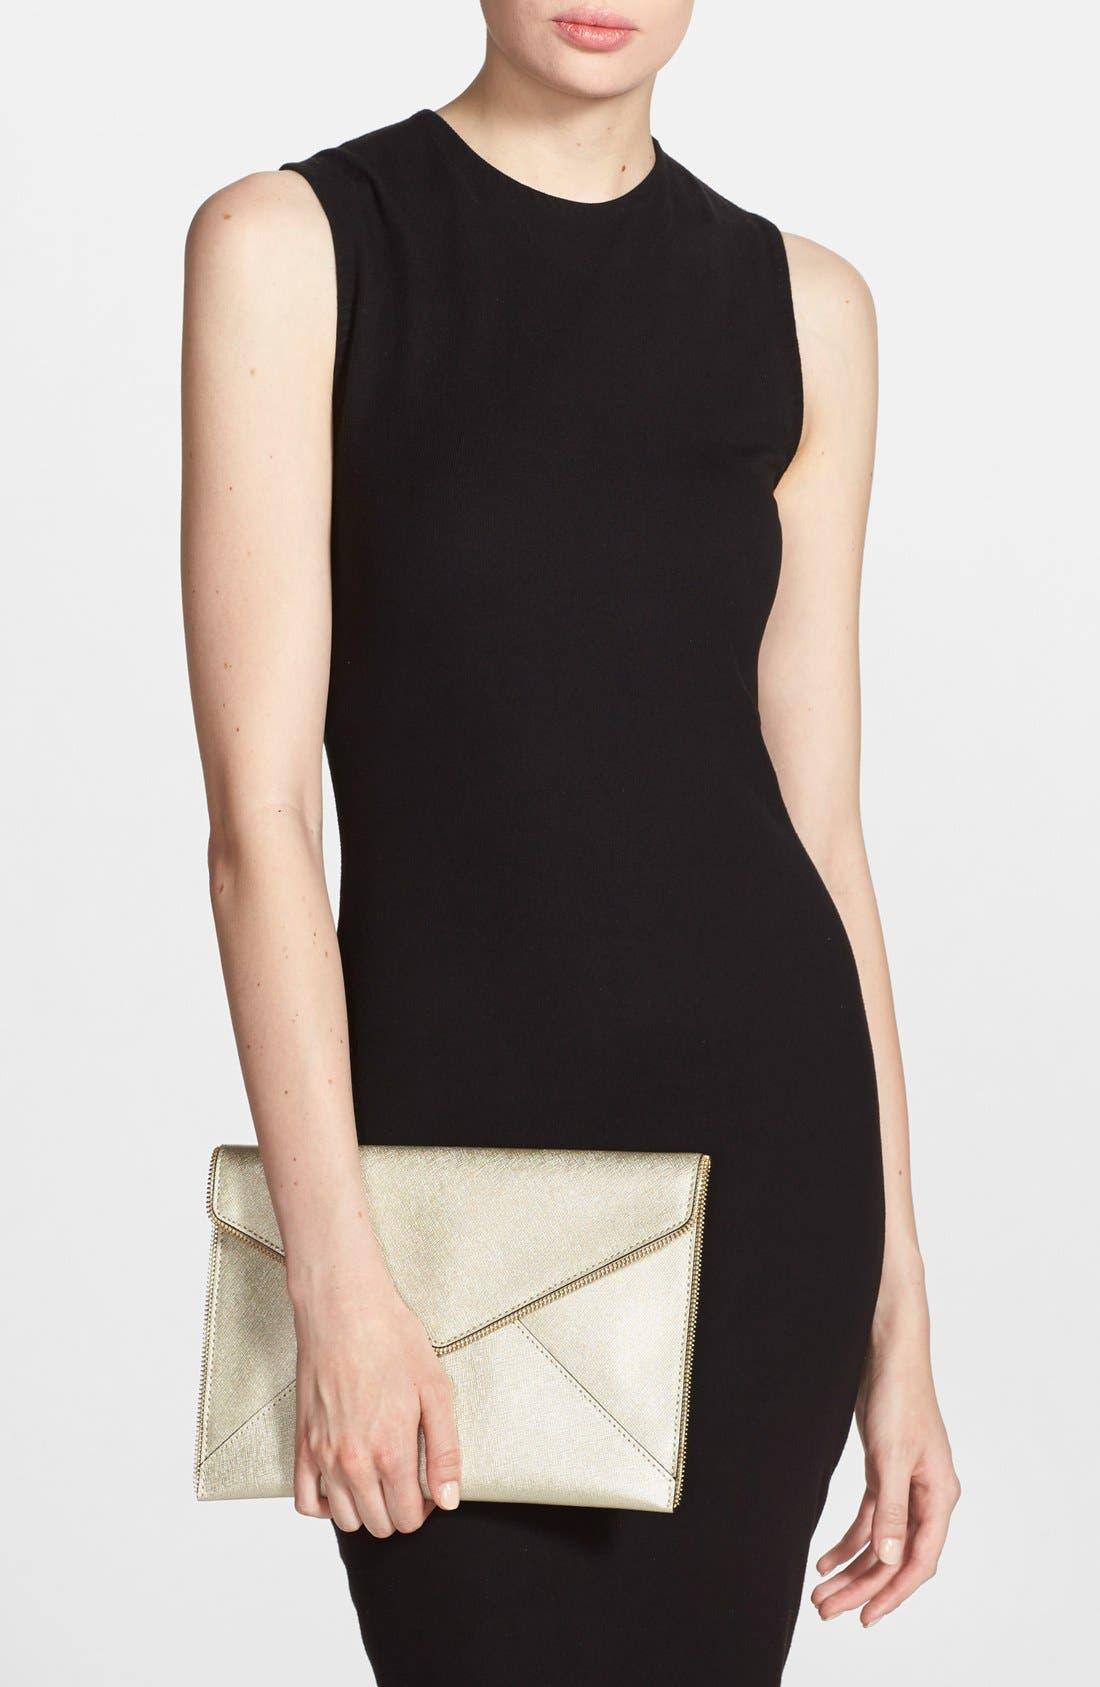 Alternate Image 2  - Rebecca Minkoff 'Leo' Saffiano Leather Envelope Clutch